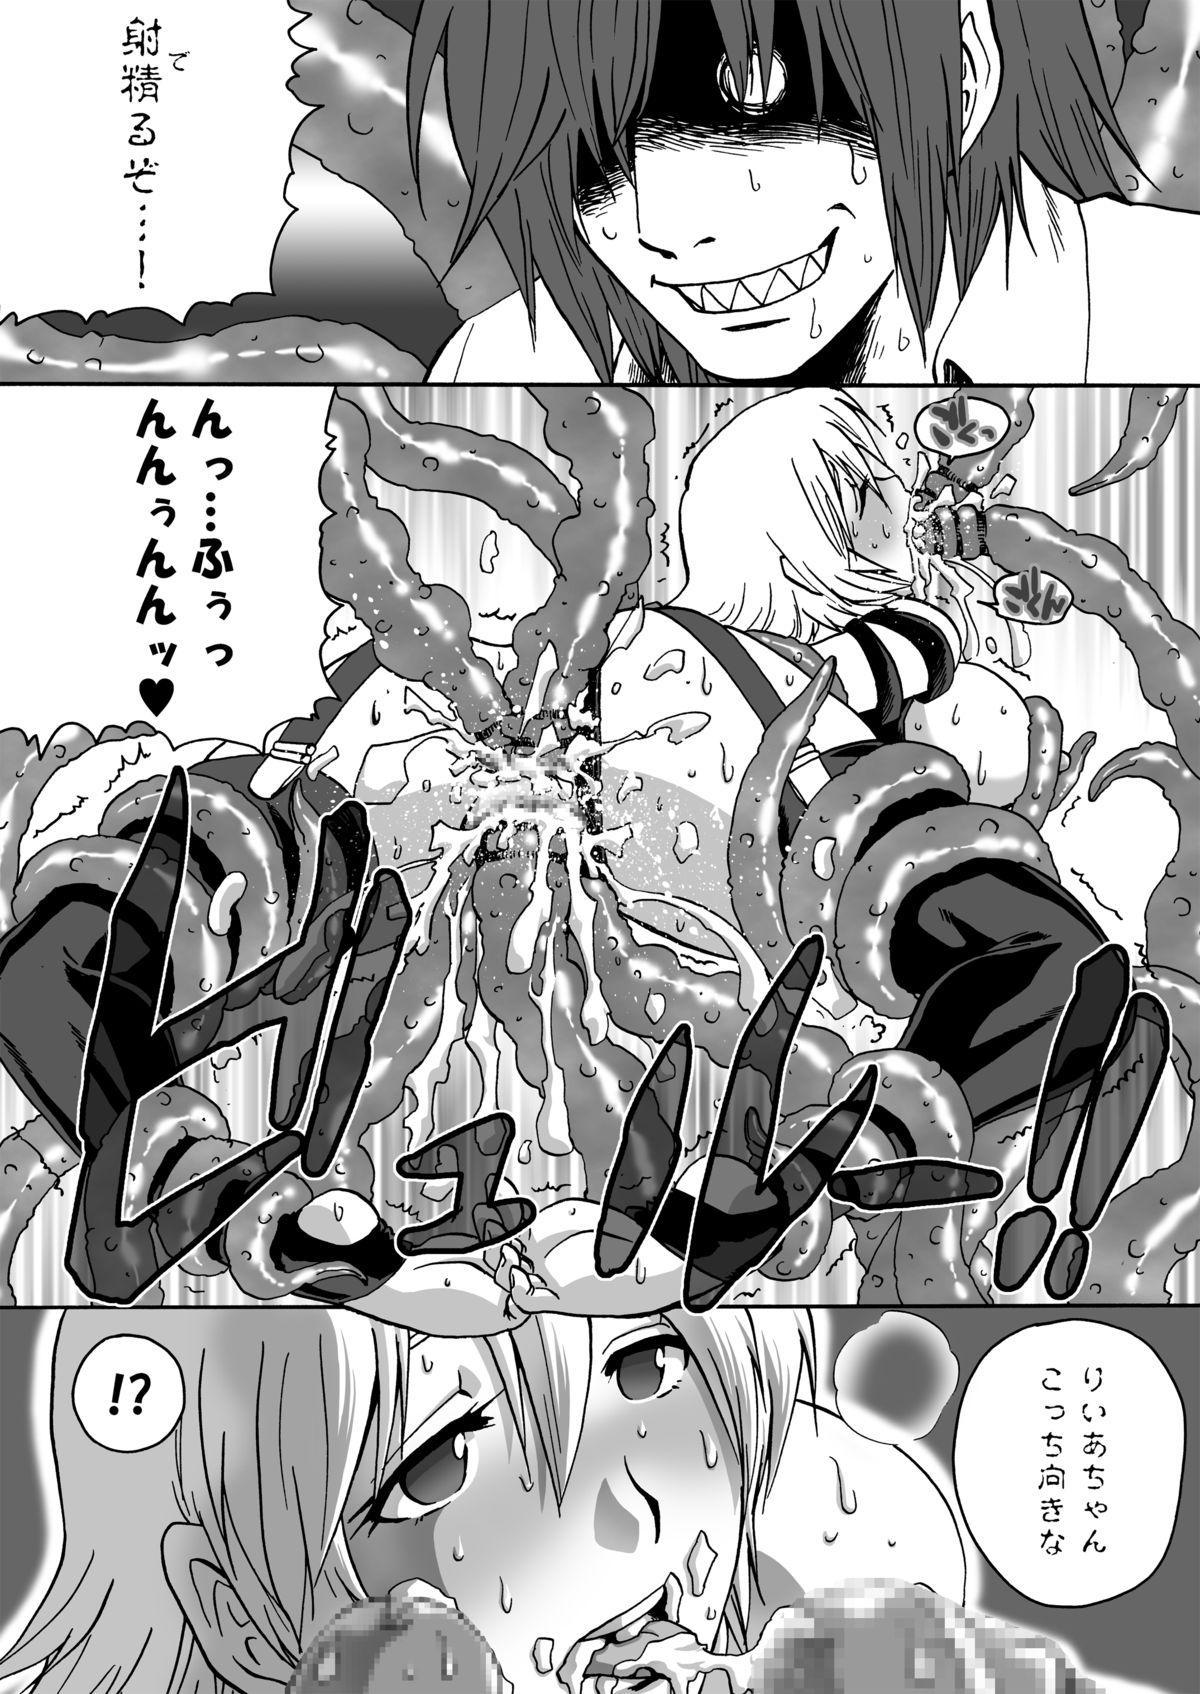 Igyou-san To 13